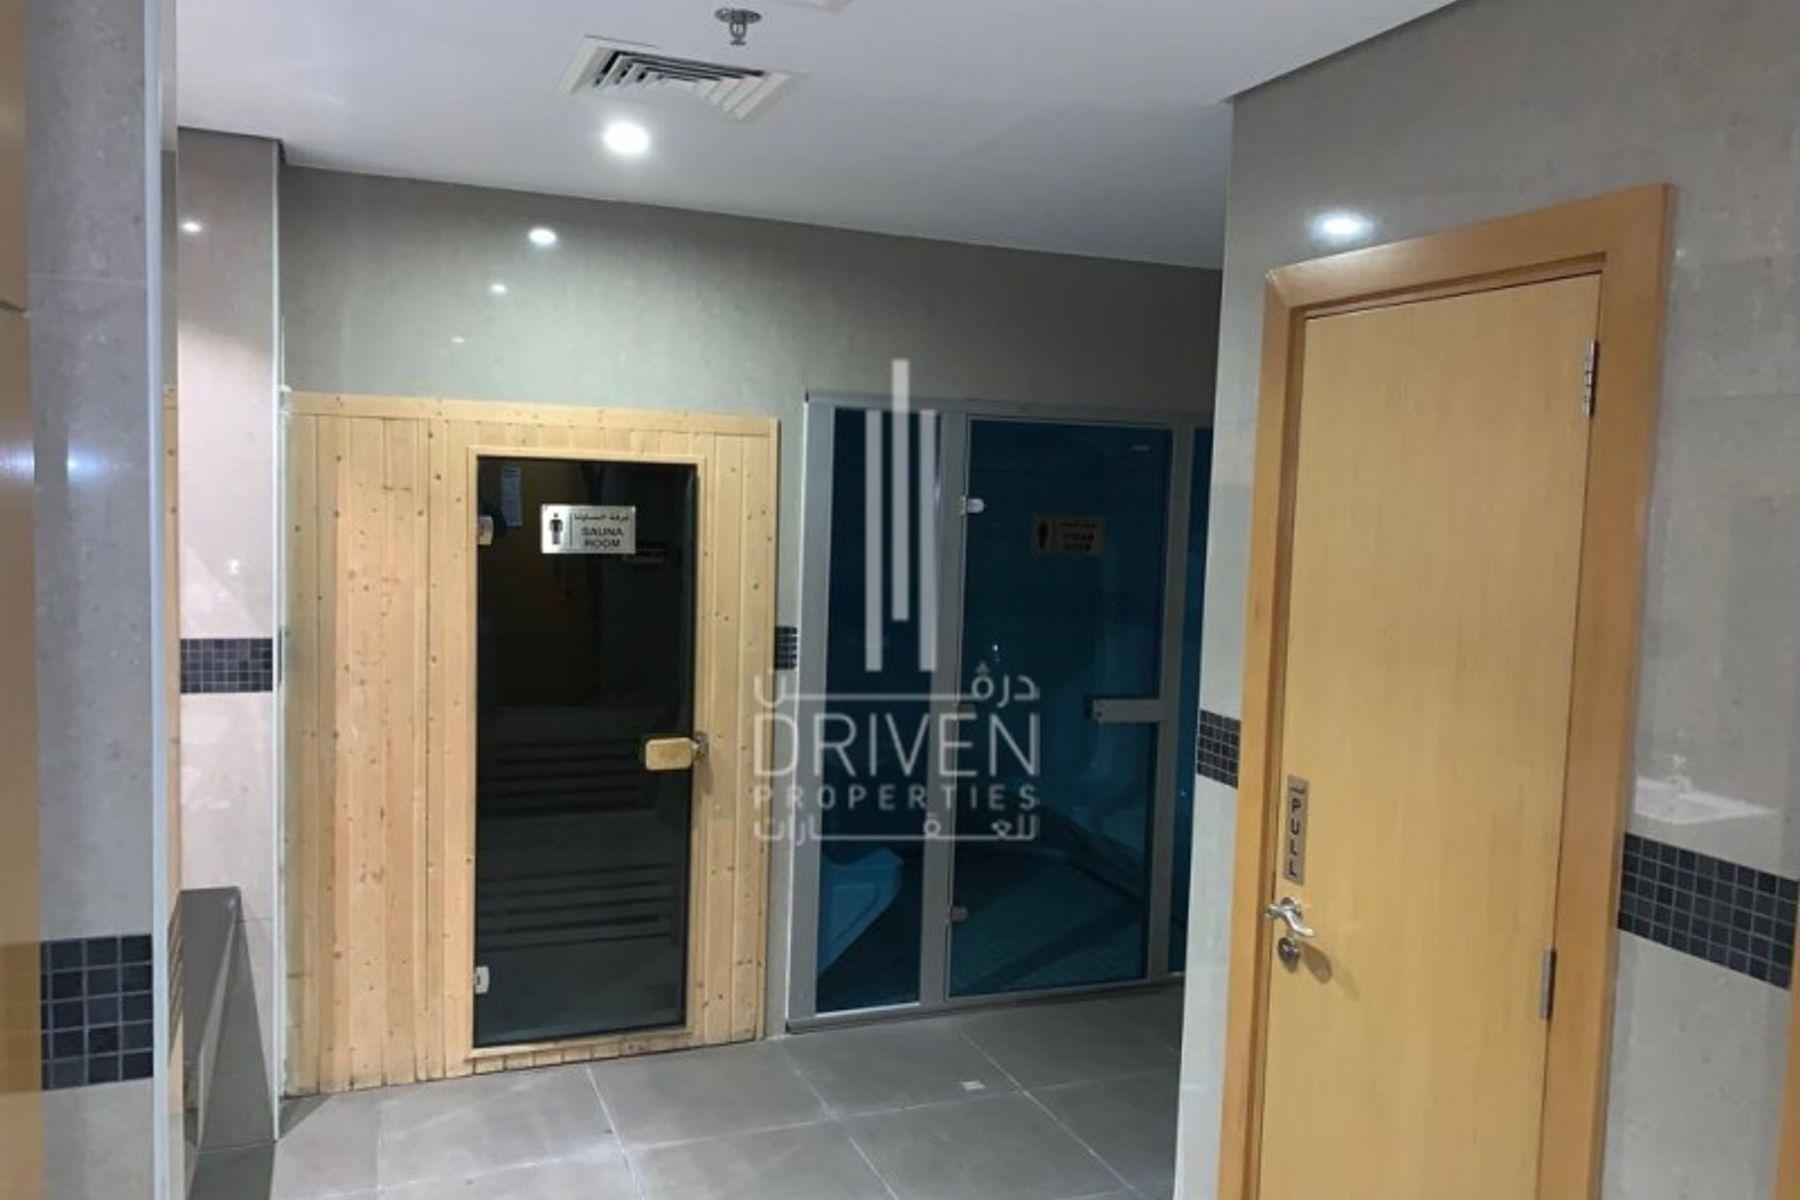 Studio for Rent in Lincoln Park, Arjan